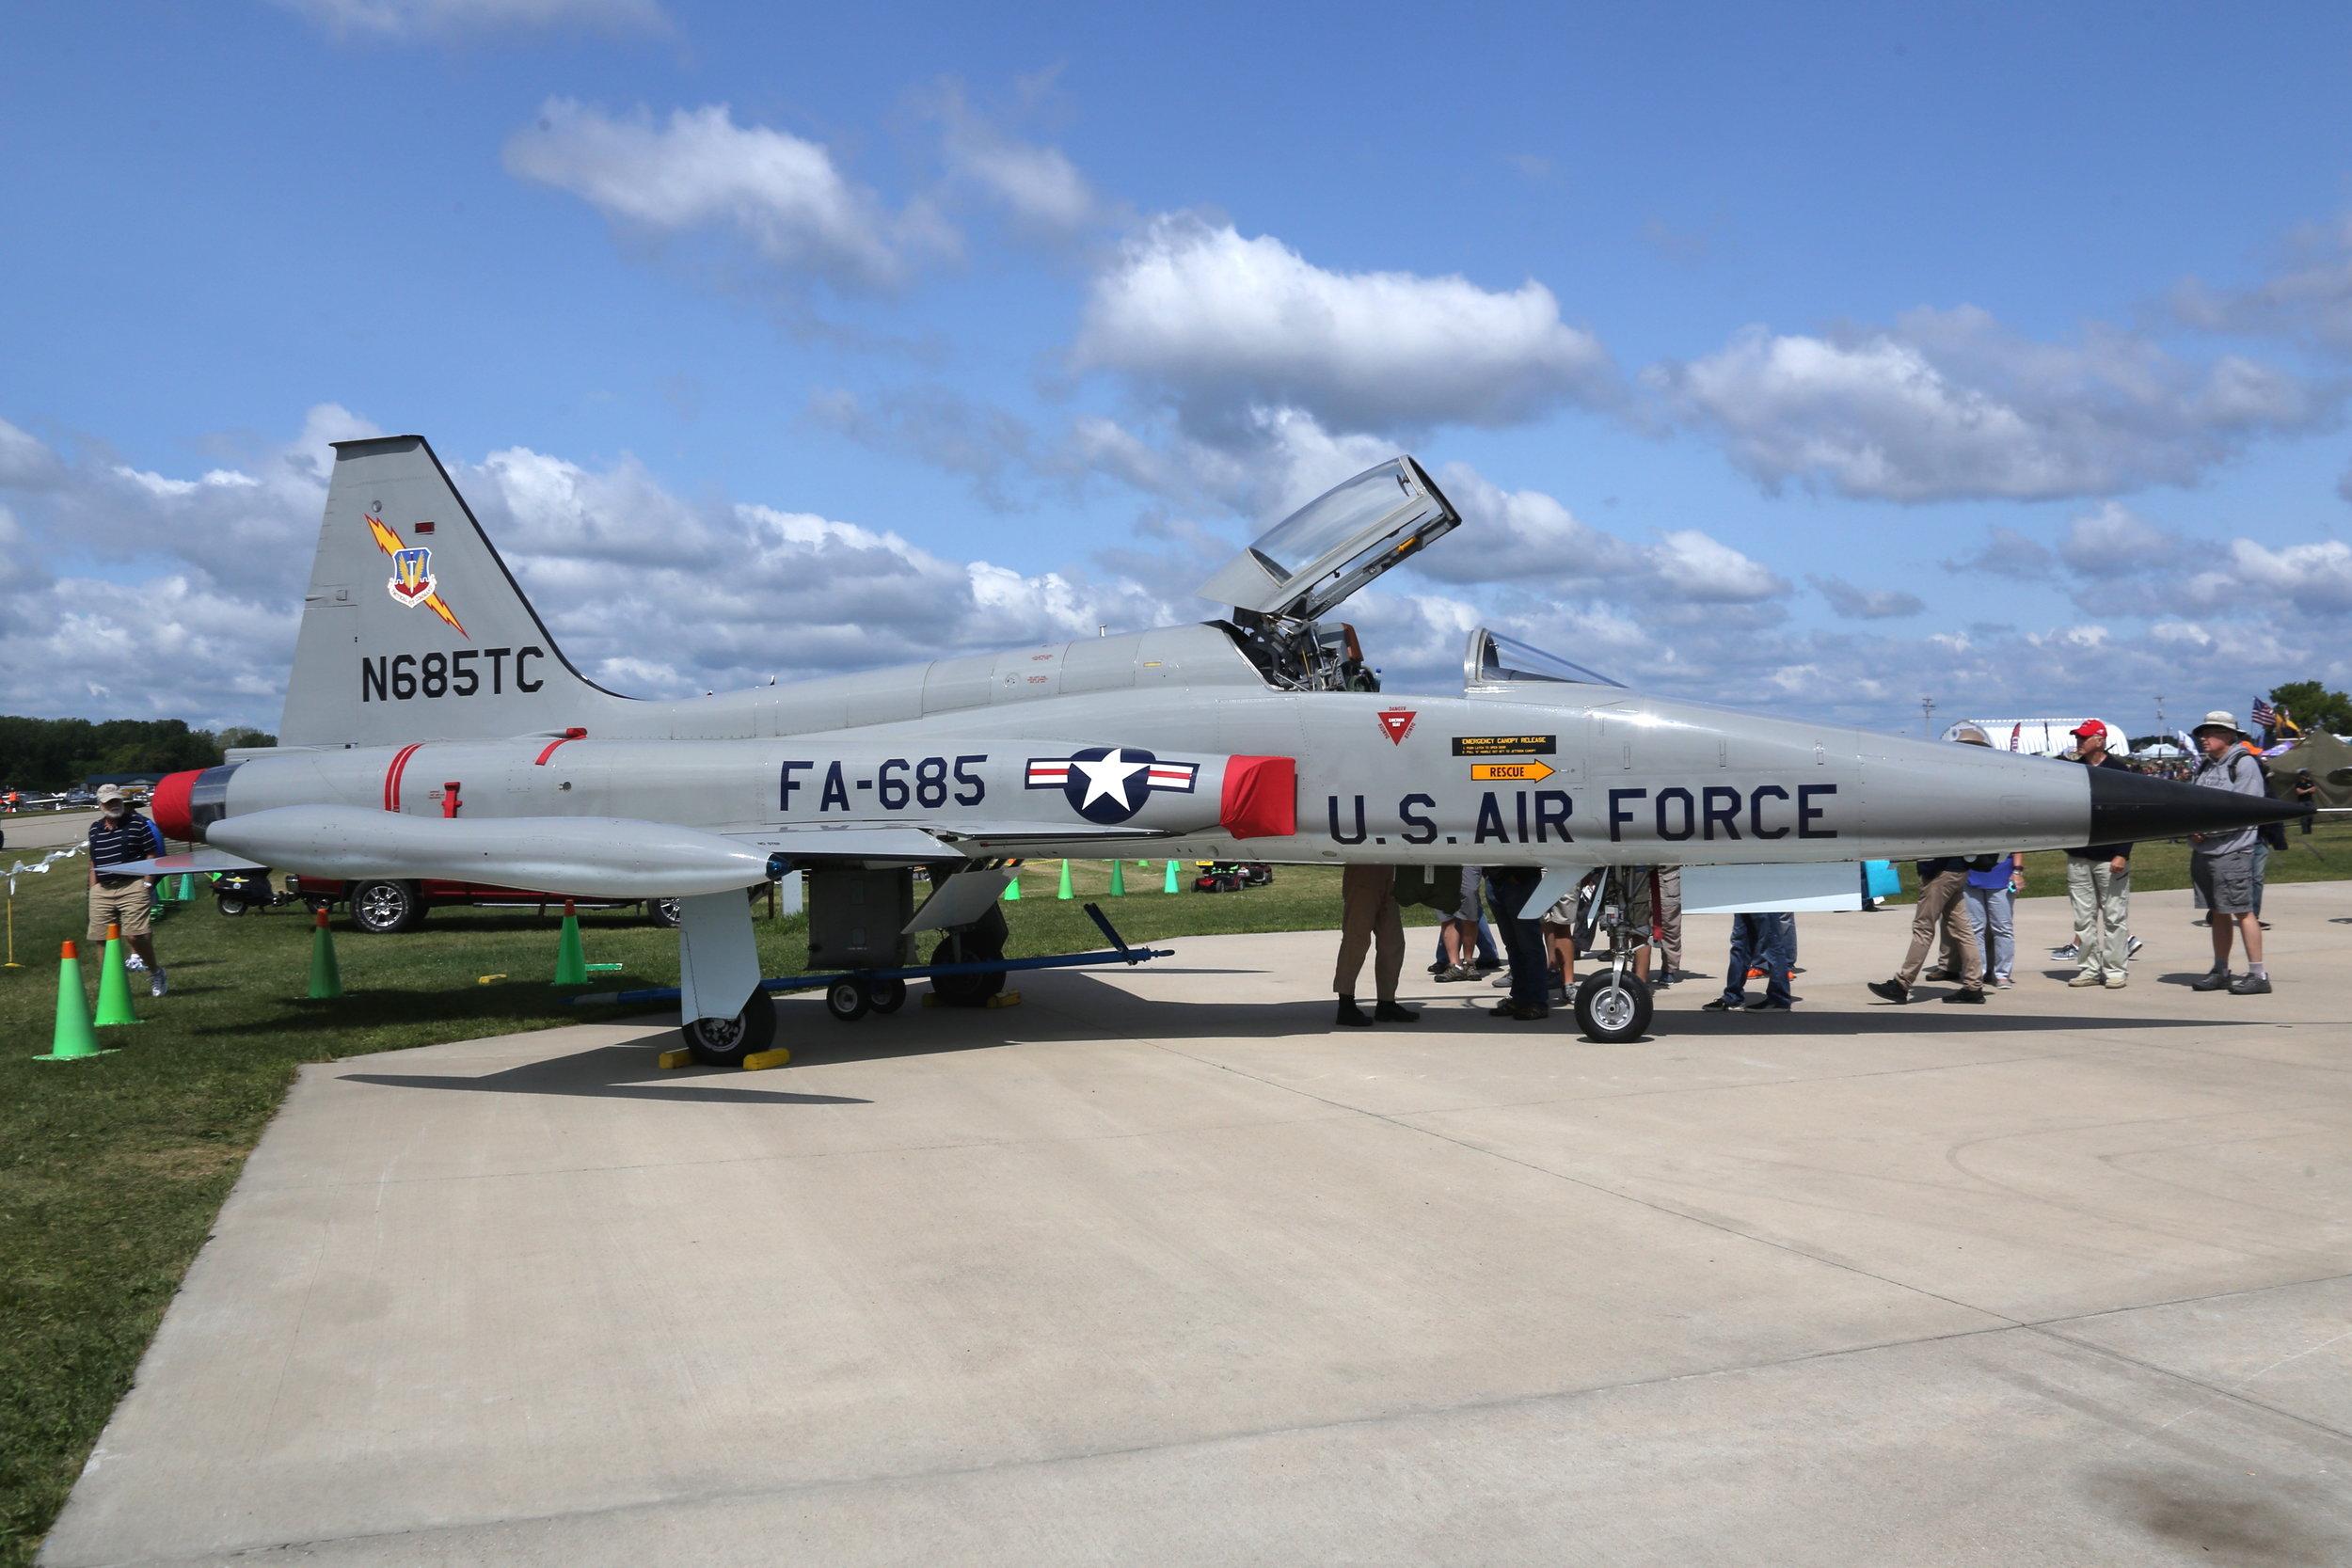 N685TC Thornton Corporation F-5A taken at Oshkosh 27th July 2018 by John Wood